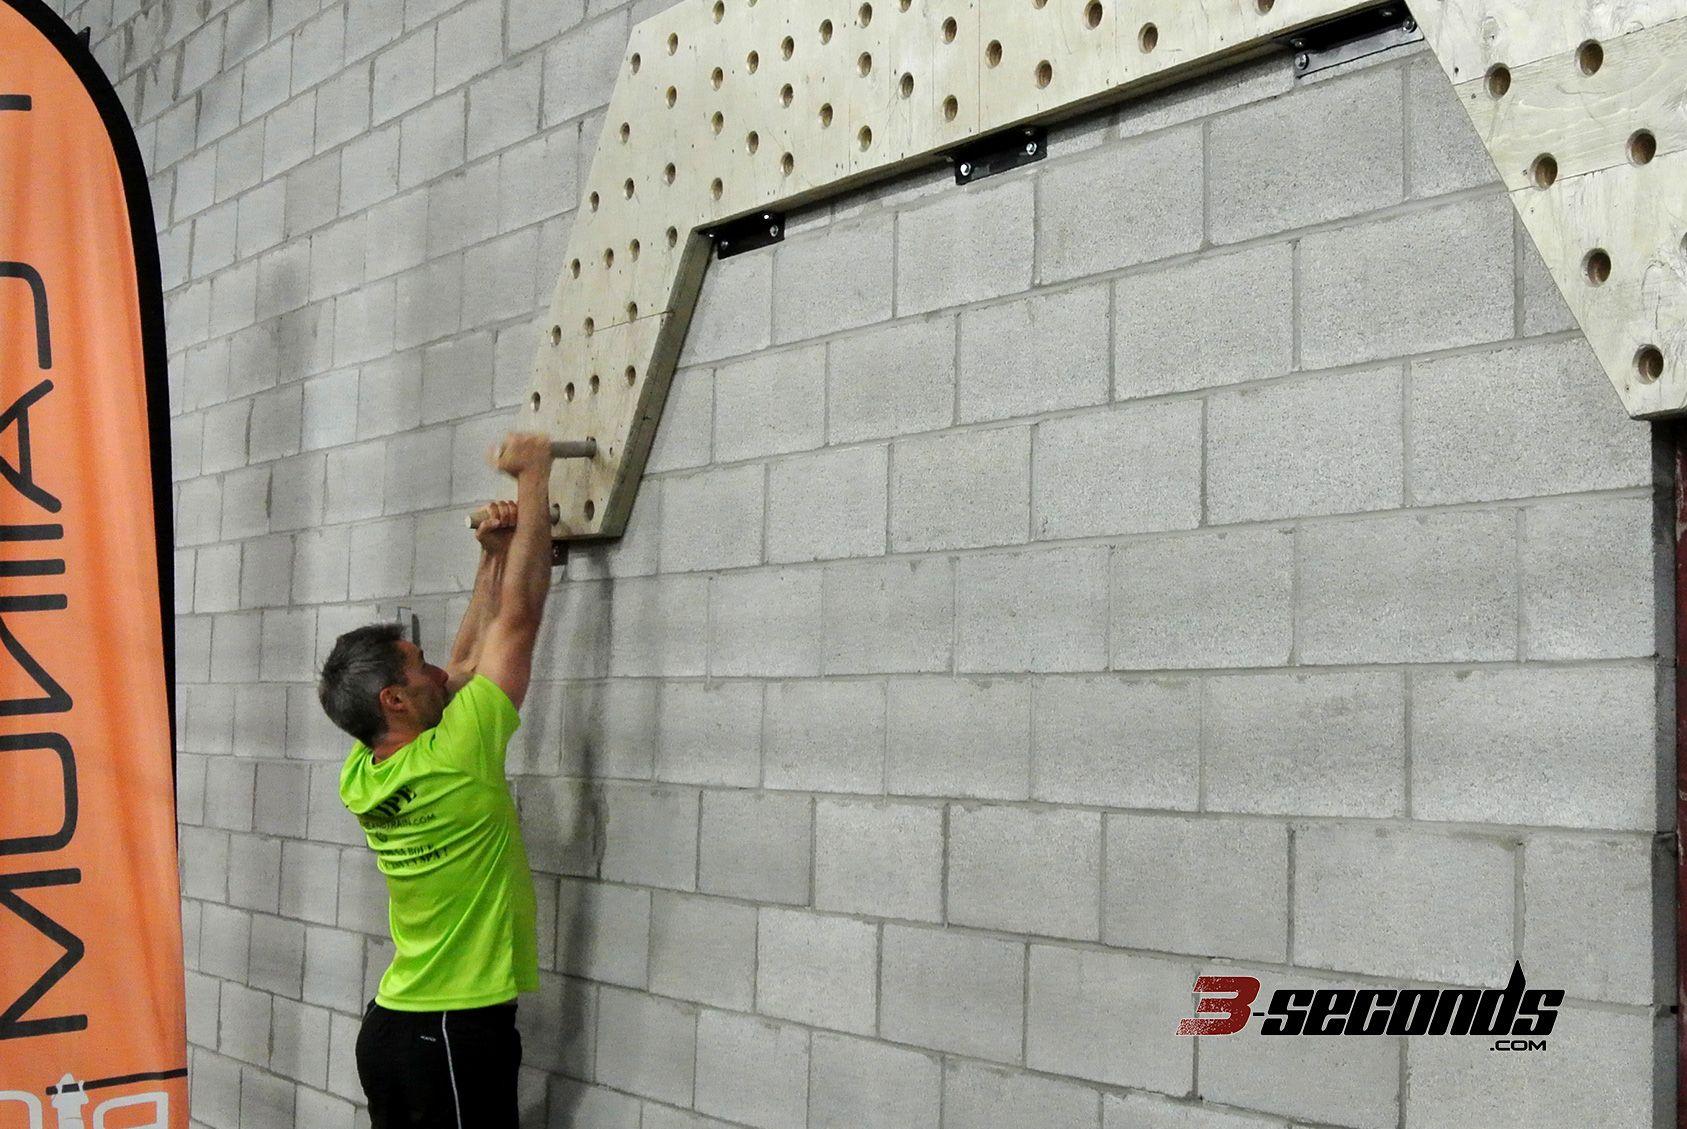 warehouse gym design - Google Search | Gym ideas | Pinterest | Gym ...